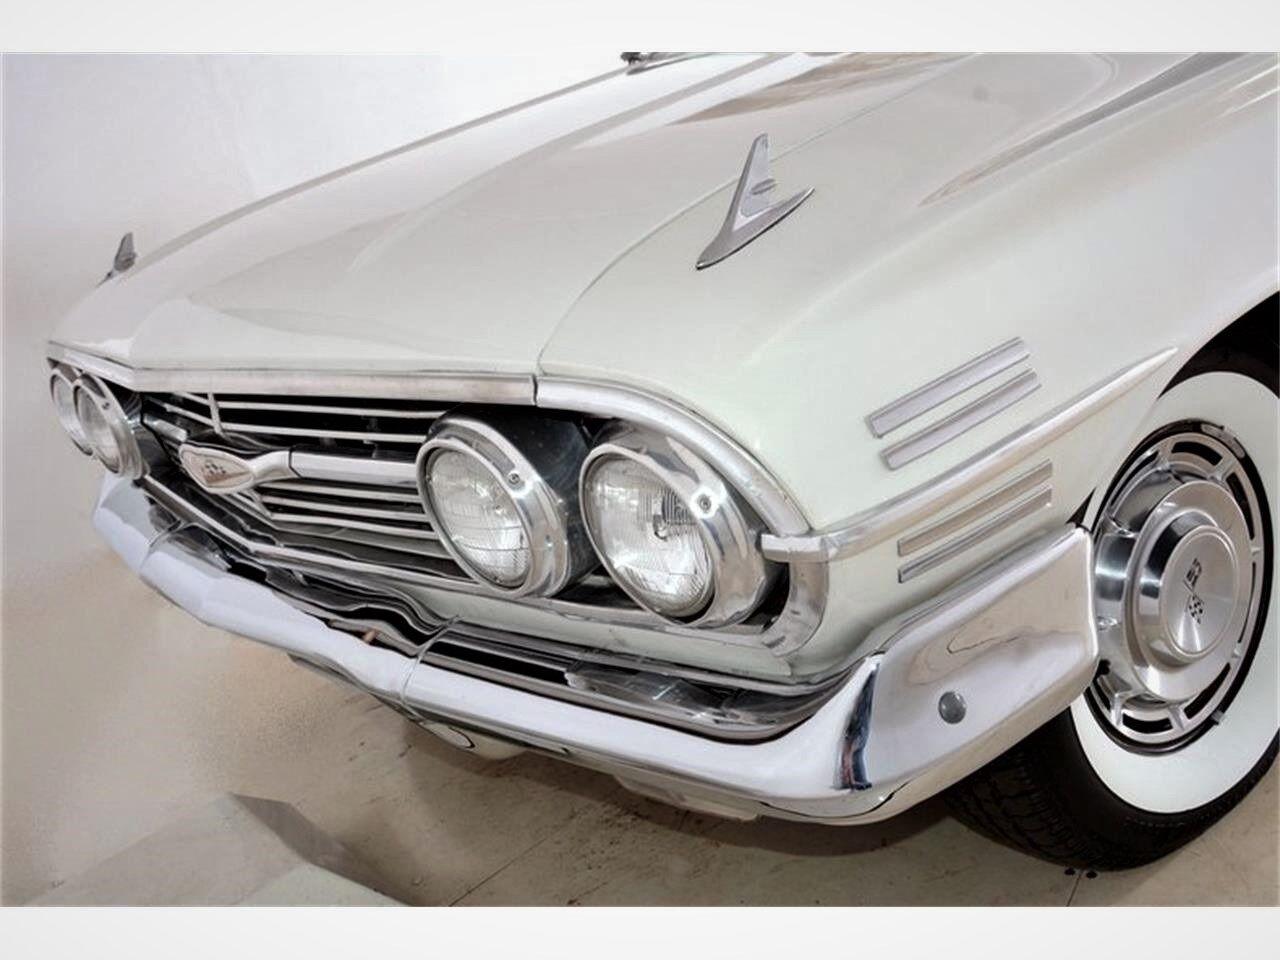 Chevy impala 1 chevrolet gebaut, 1960 sportmodell 25 wagen 24 jahrgang 12 konzept.